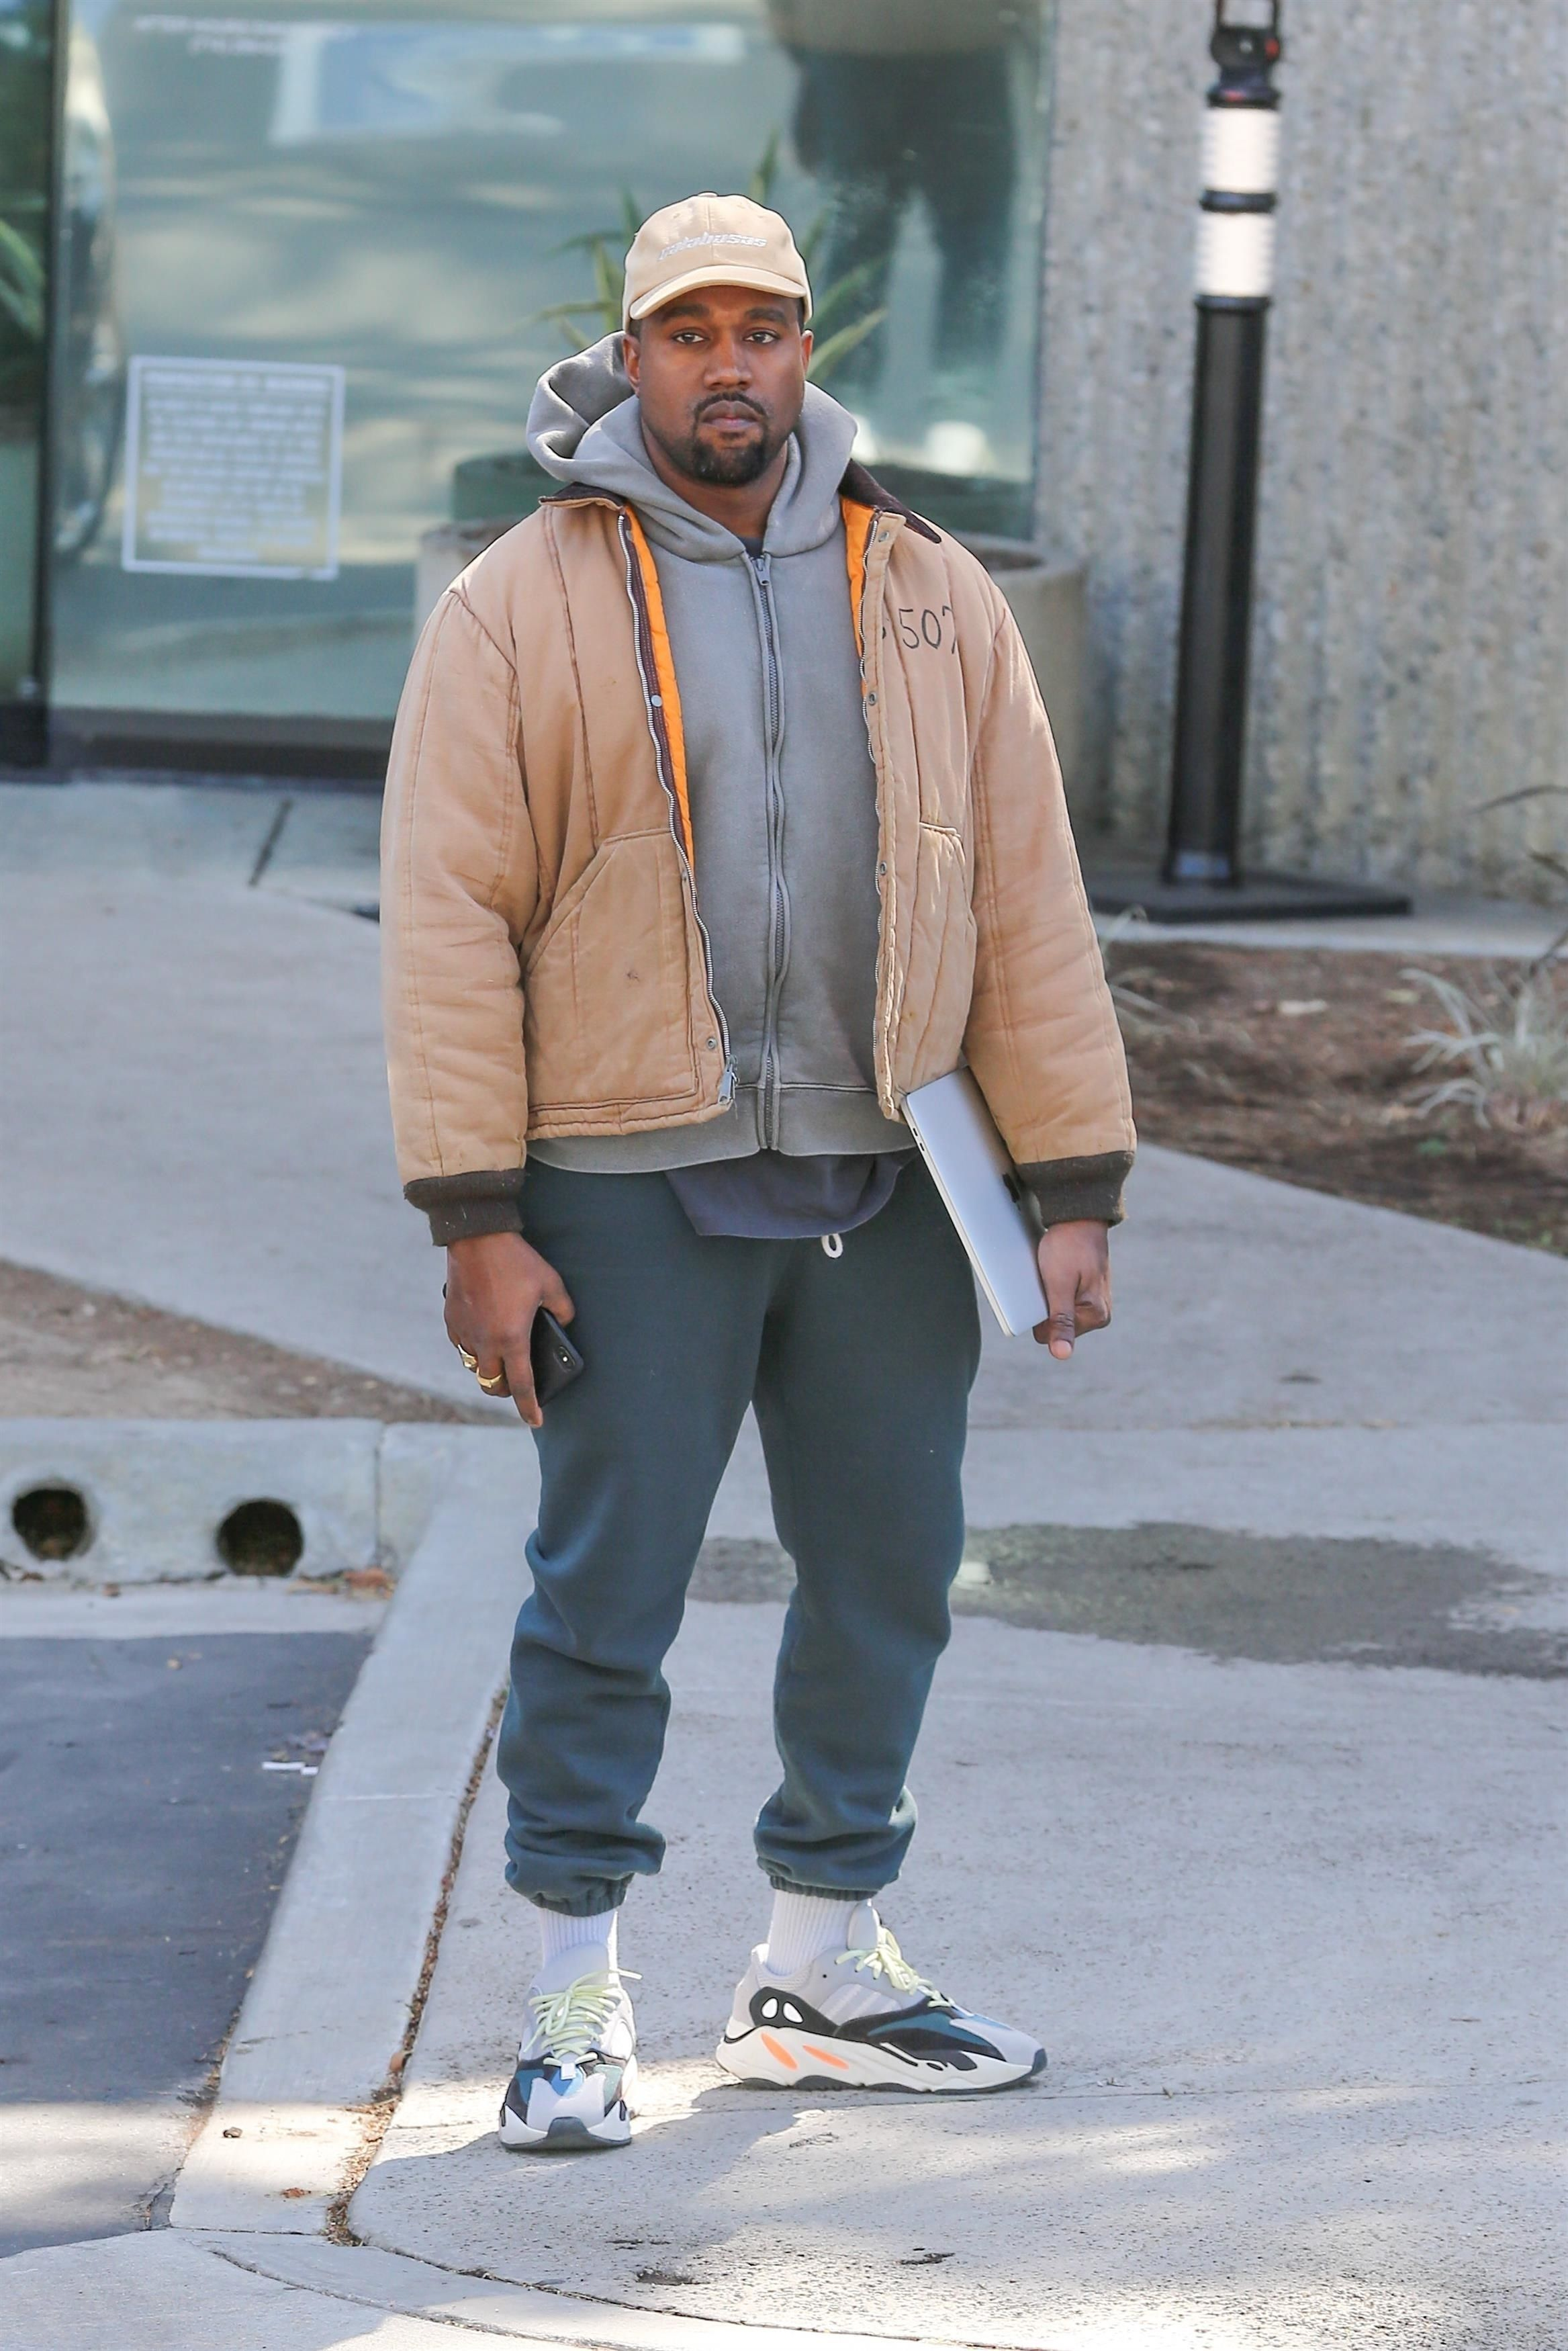 Kanye West Style Kanye West Style Kanye Kanyewest Style Toystory West In 2020 Kanye West Style Kanye West Outfits Kanye Fashion